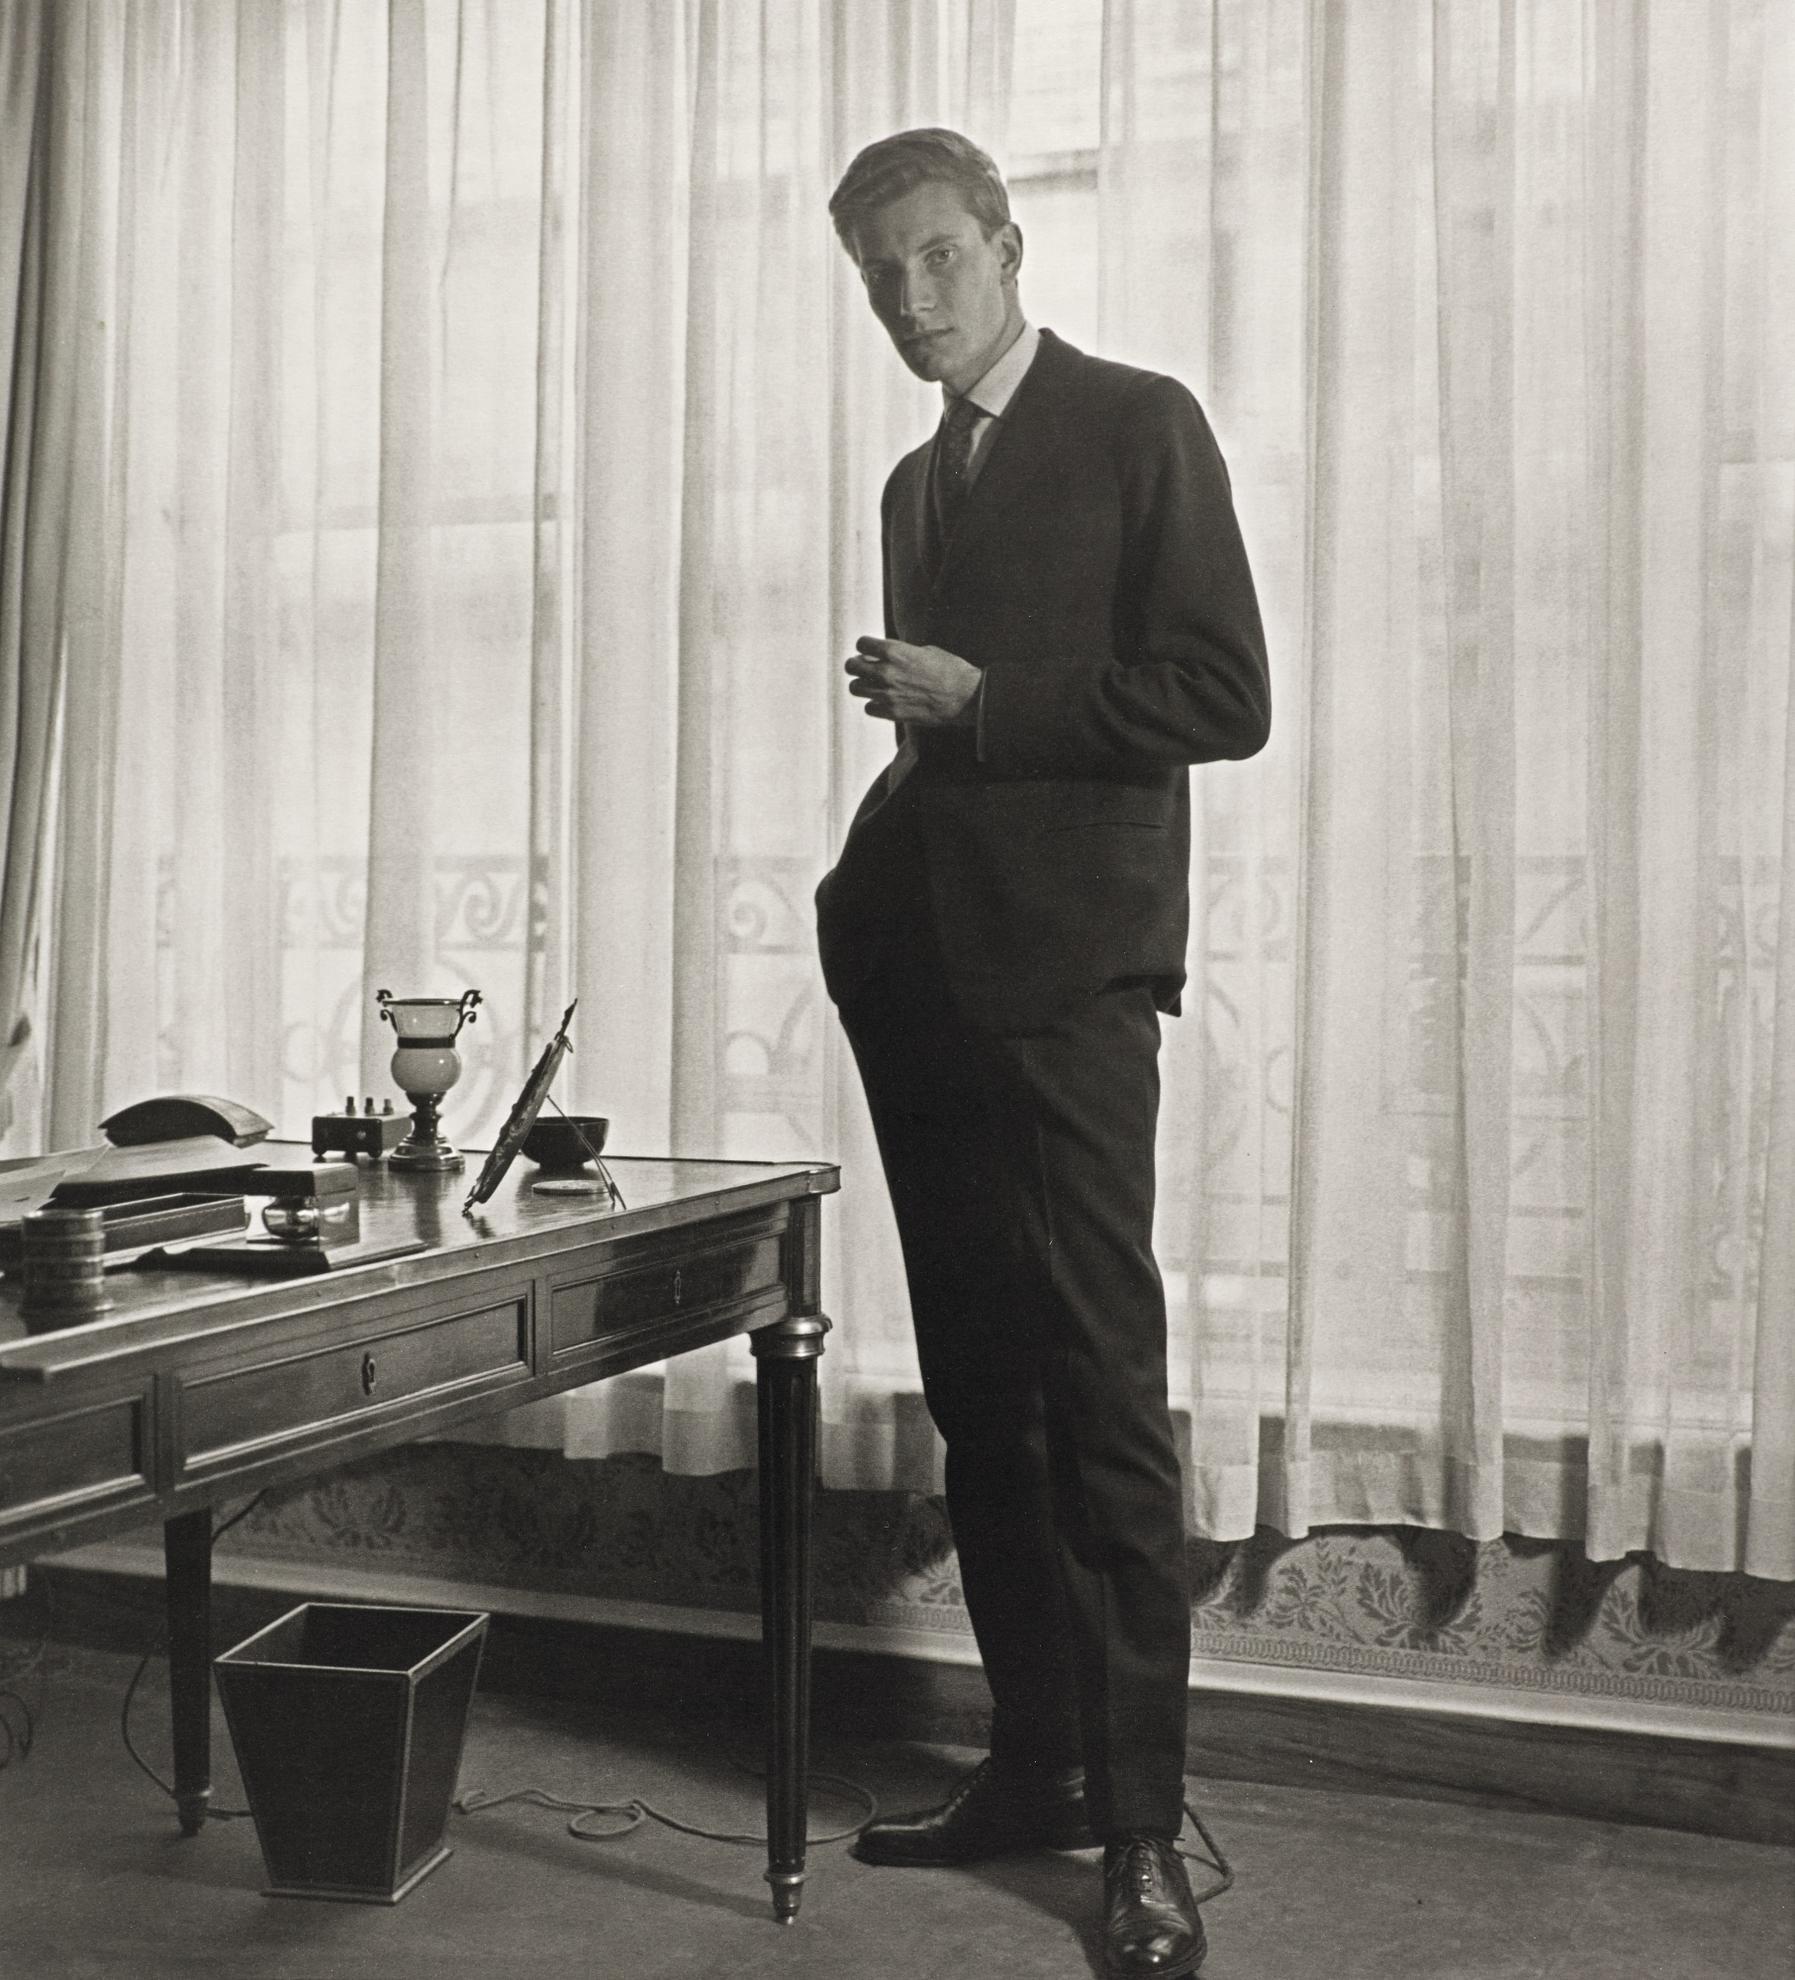 Horst P. Horst-Yves Saint Laurent At 'Diors', Paris, 1958-1958